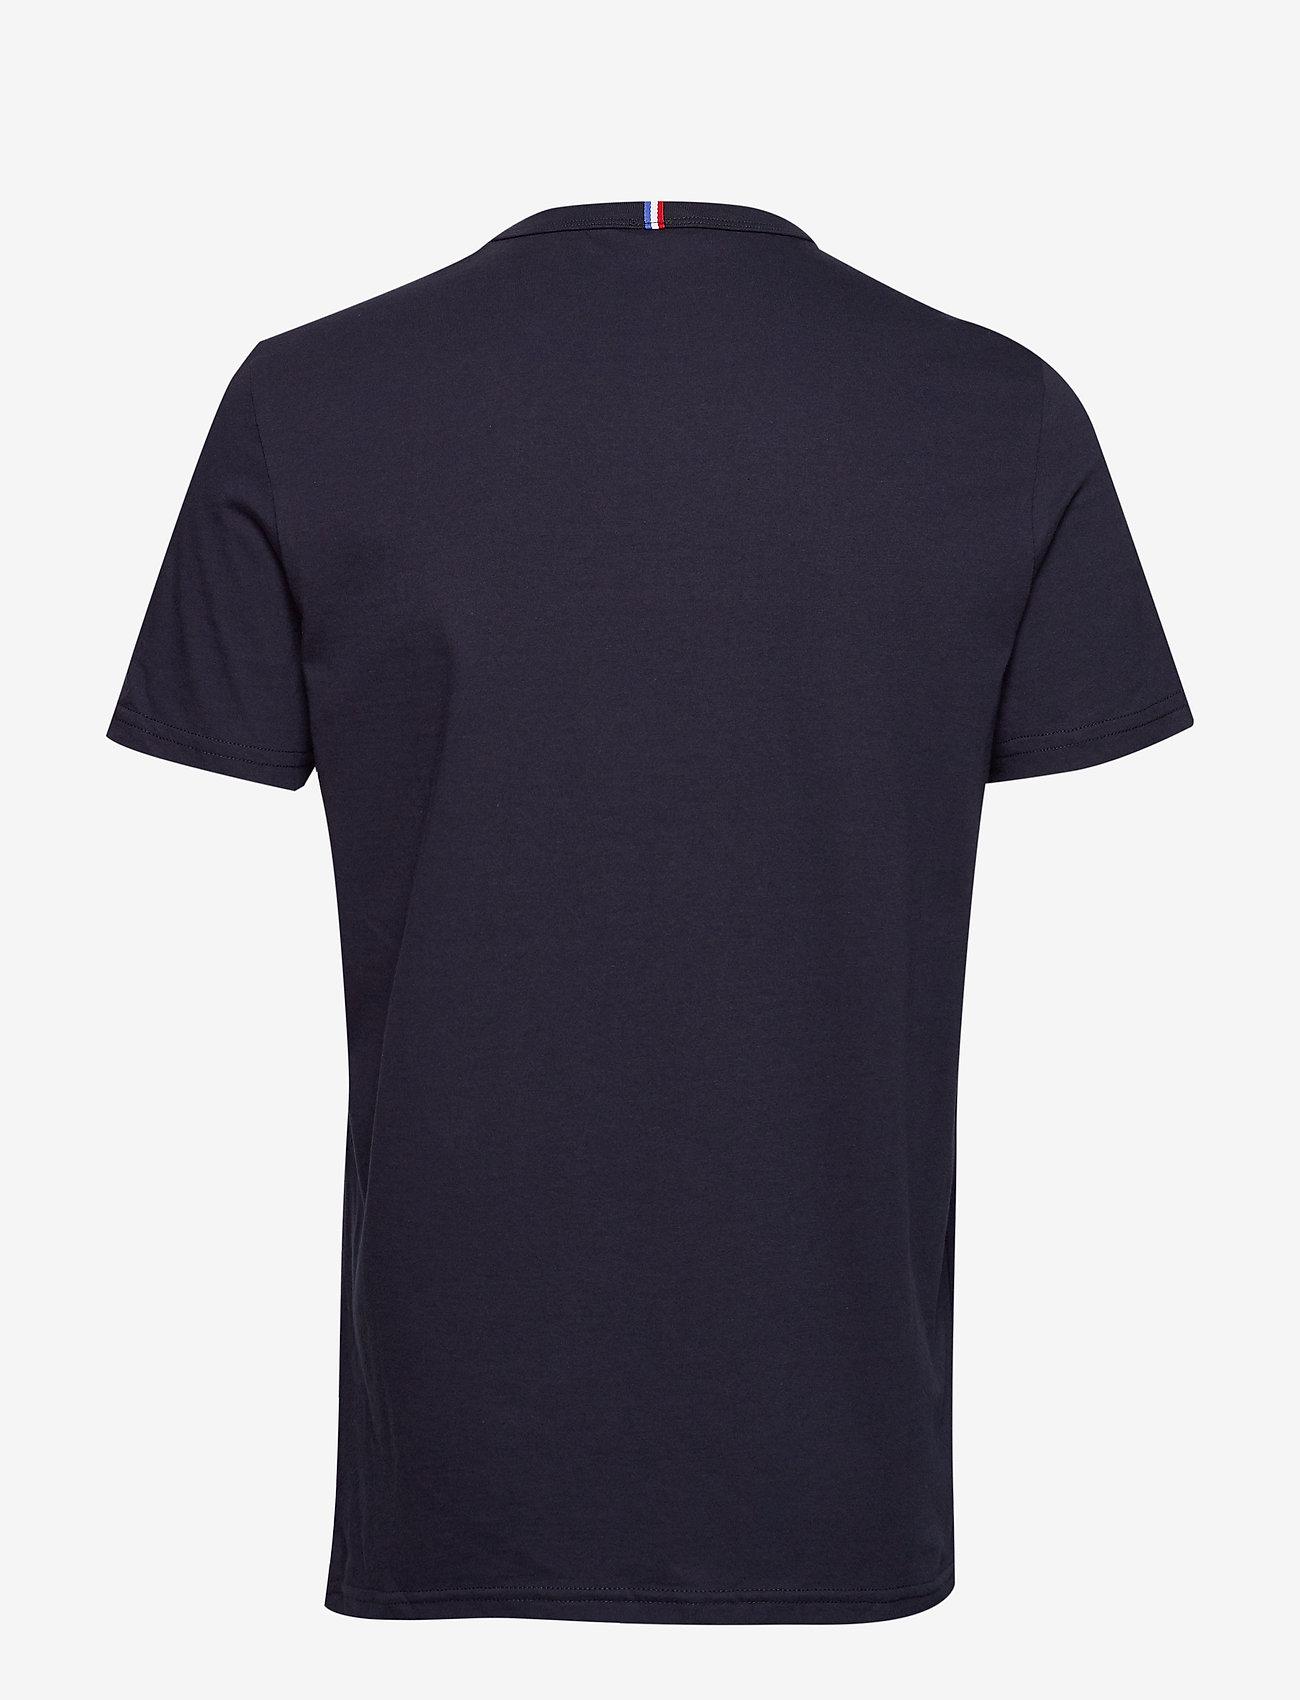 Le Coq Sportifess Saison Tee Ss N2 M - T-shirts